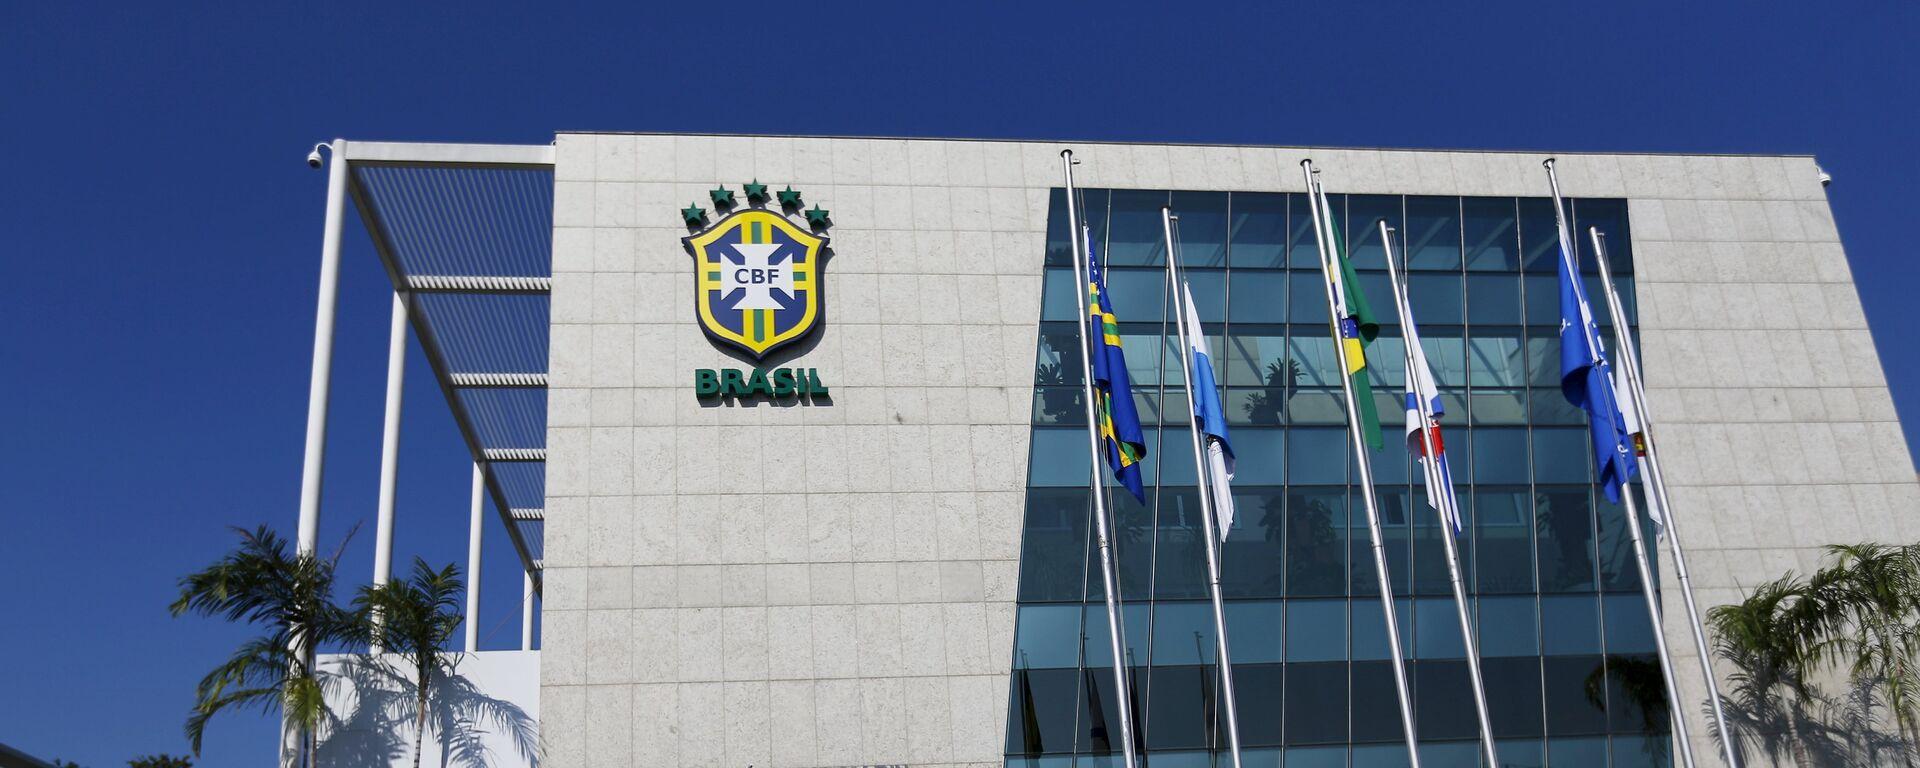 Security guards stand outside the Brazilian Football Association (CBF) headquarters in Rio de Janeiro May 27, 2015.  - Sputnik Mundo, 1920, 07.06.2021